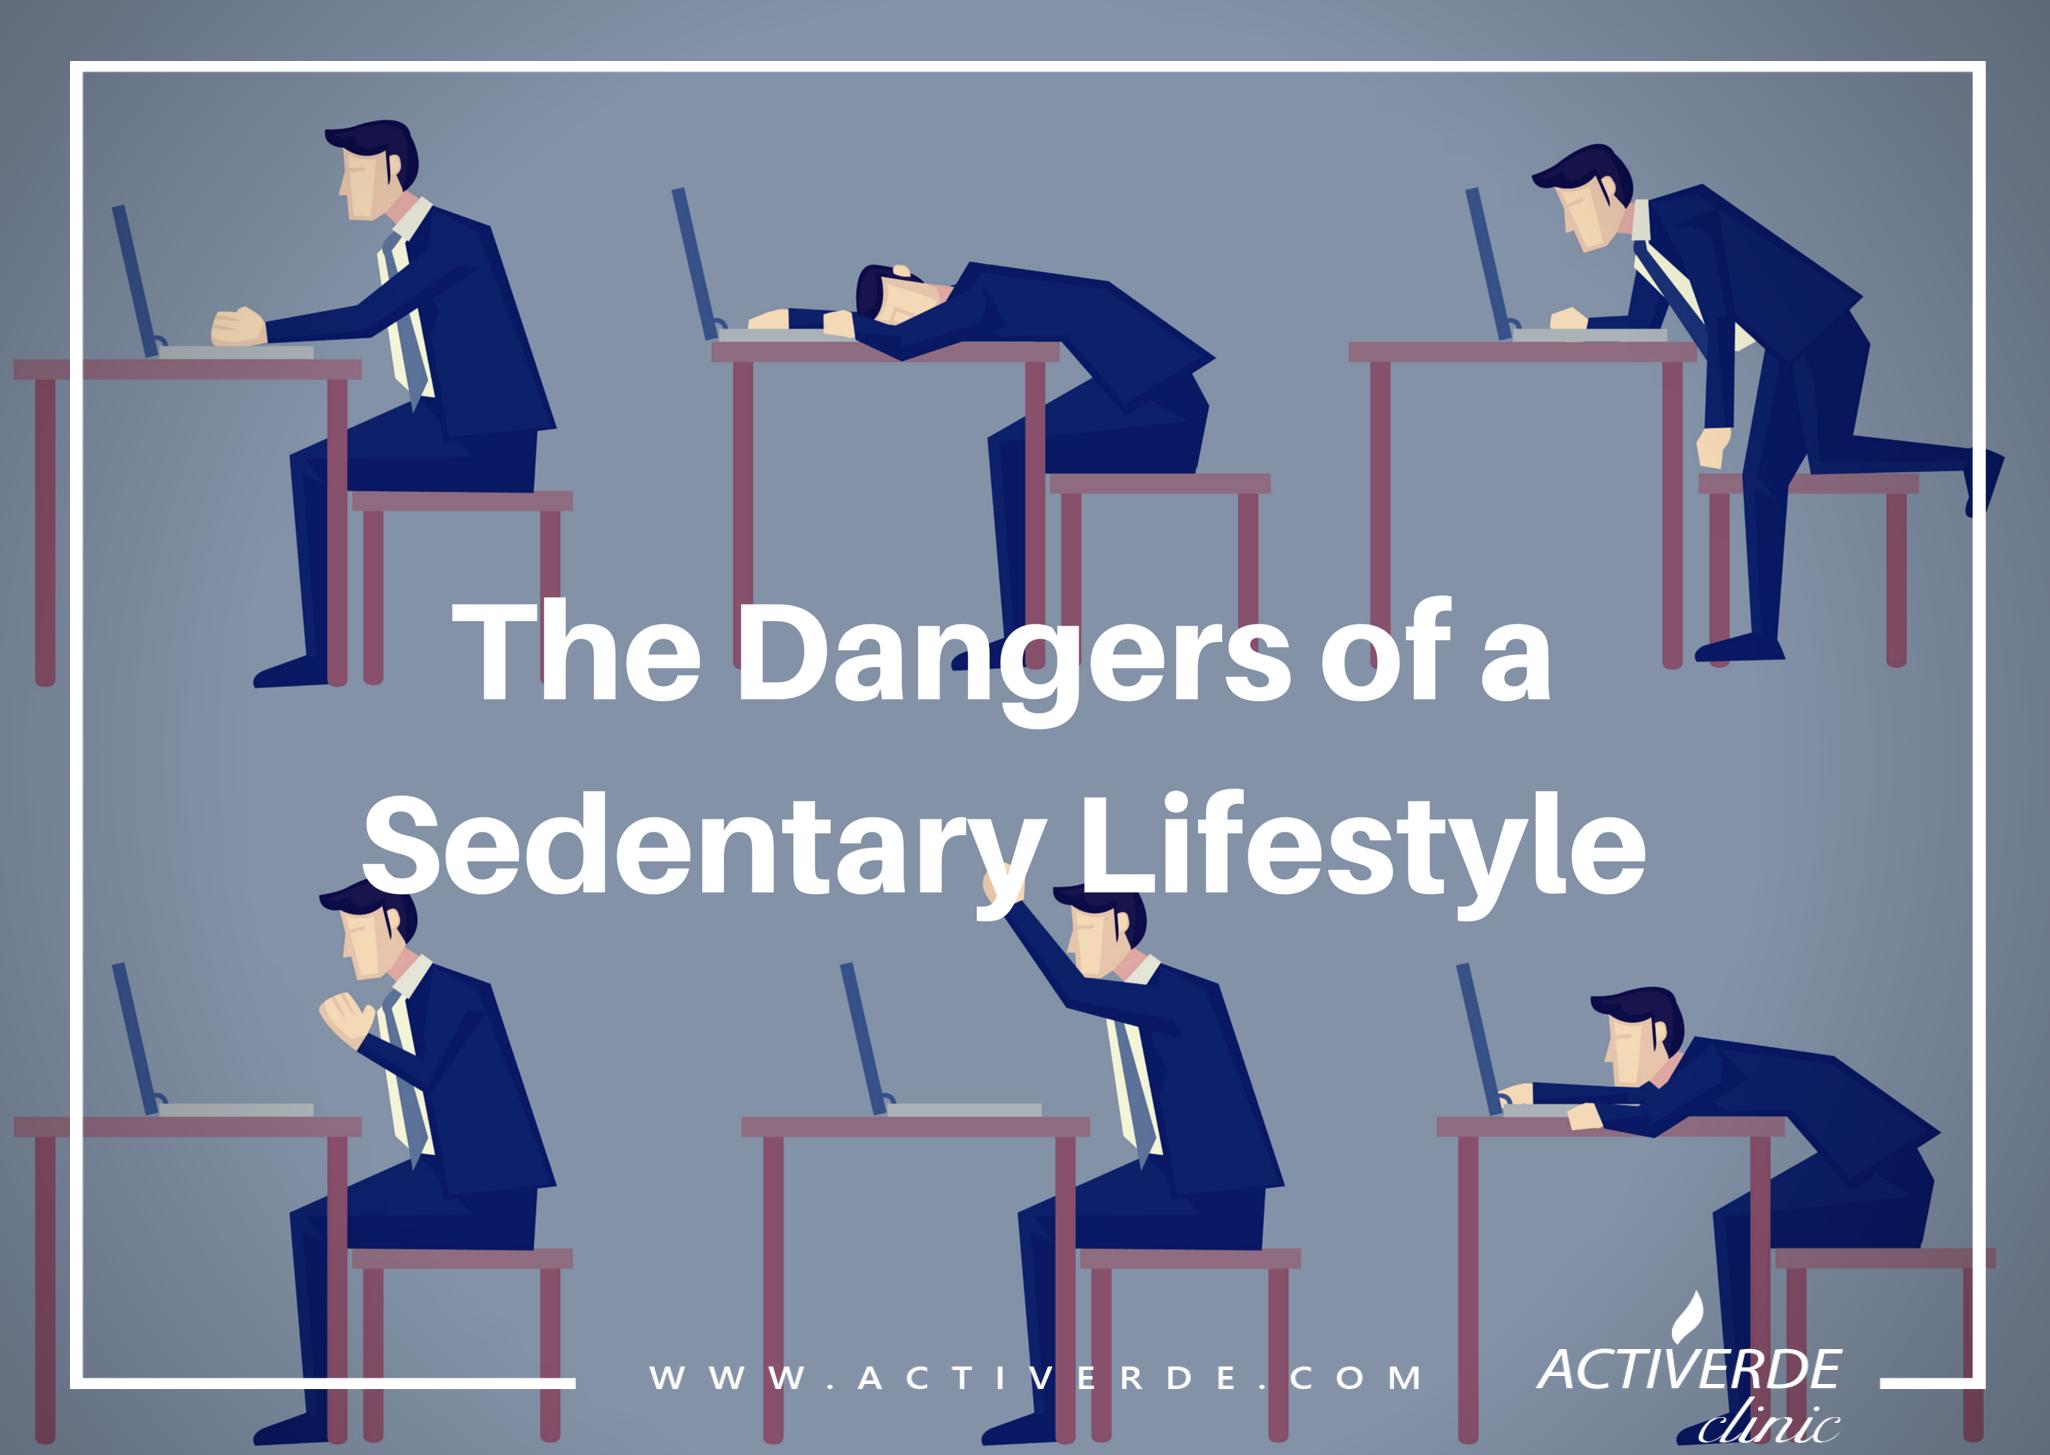 Sedentary